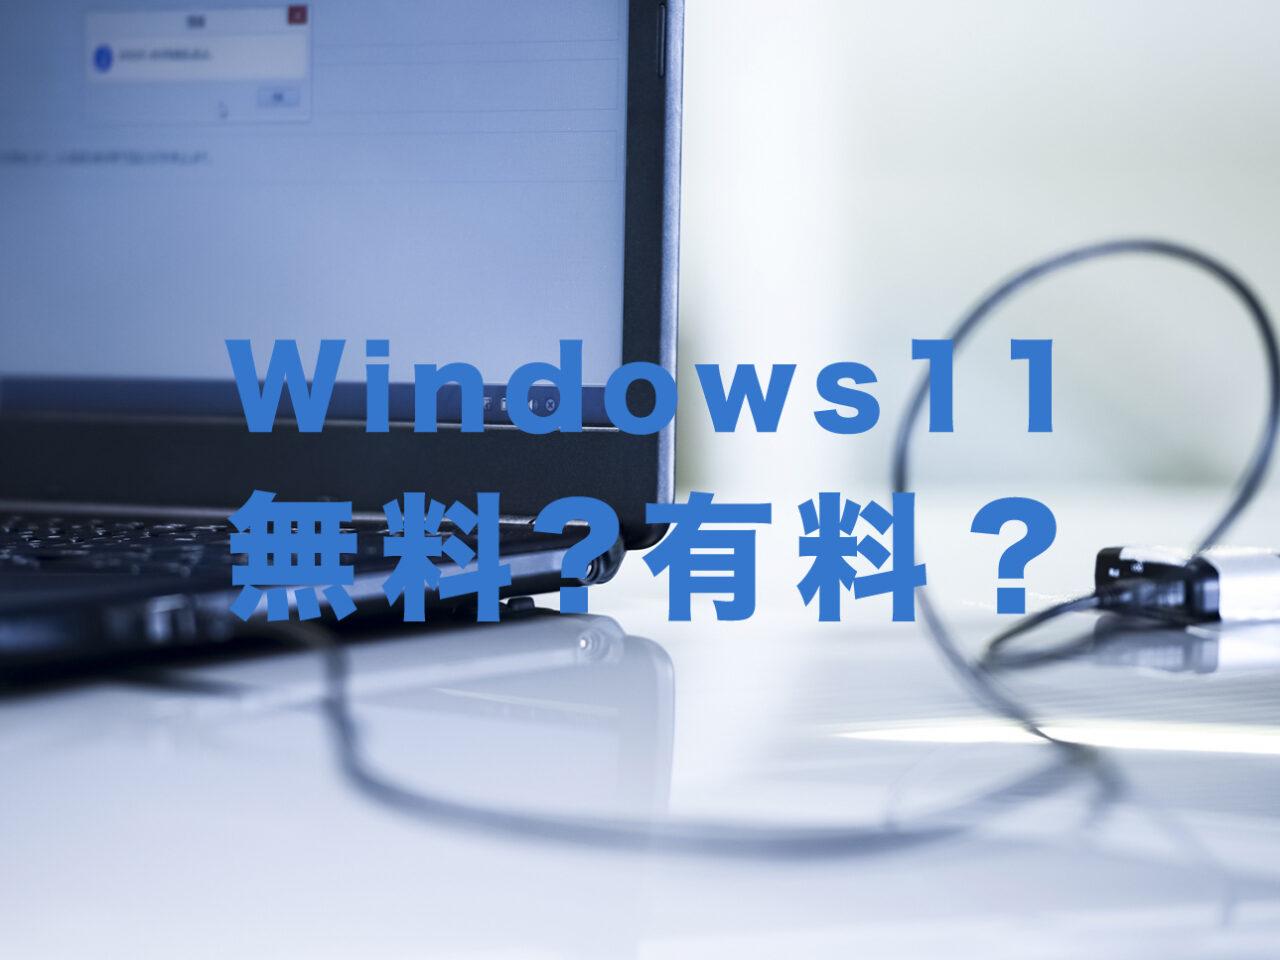 Windows11は無料?有料?アップグレードはできる?のサムネイル画像